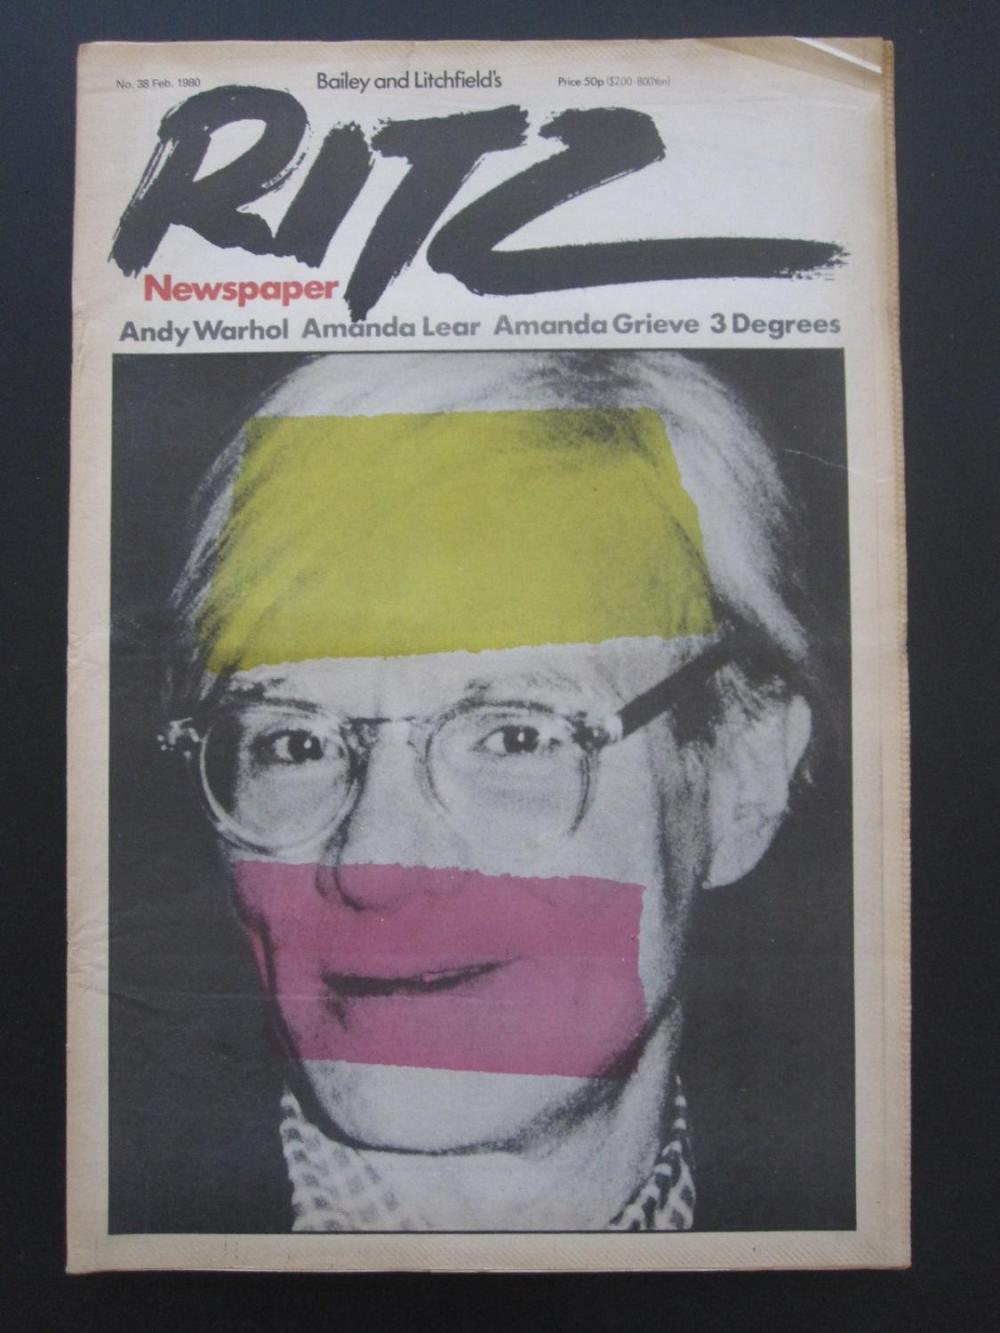 Andy Warhol, Ritz Newspaper David Bailey1980